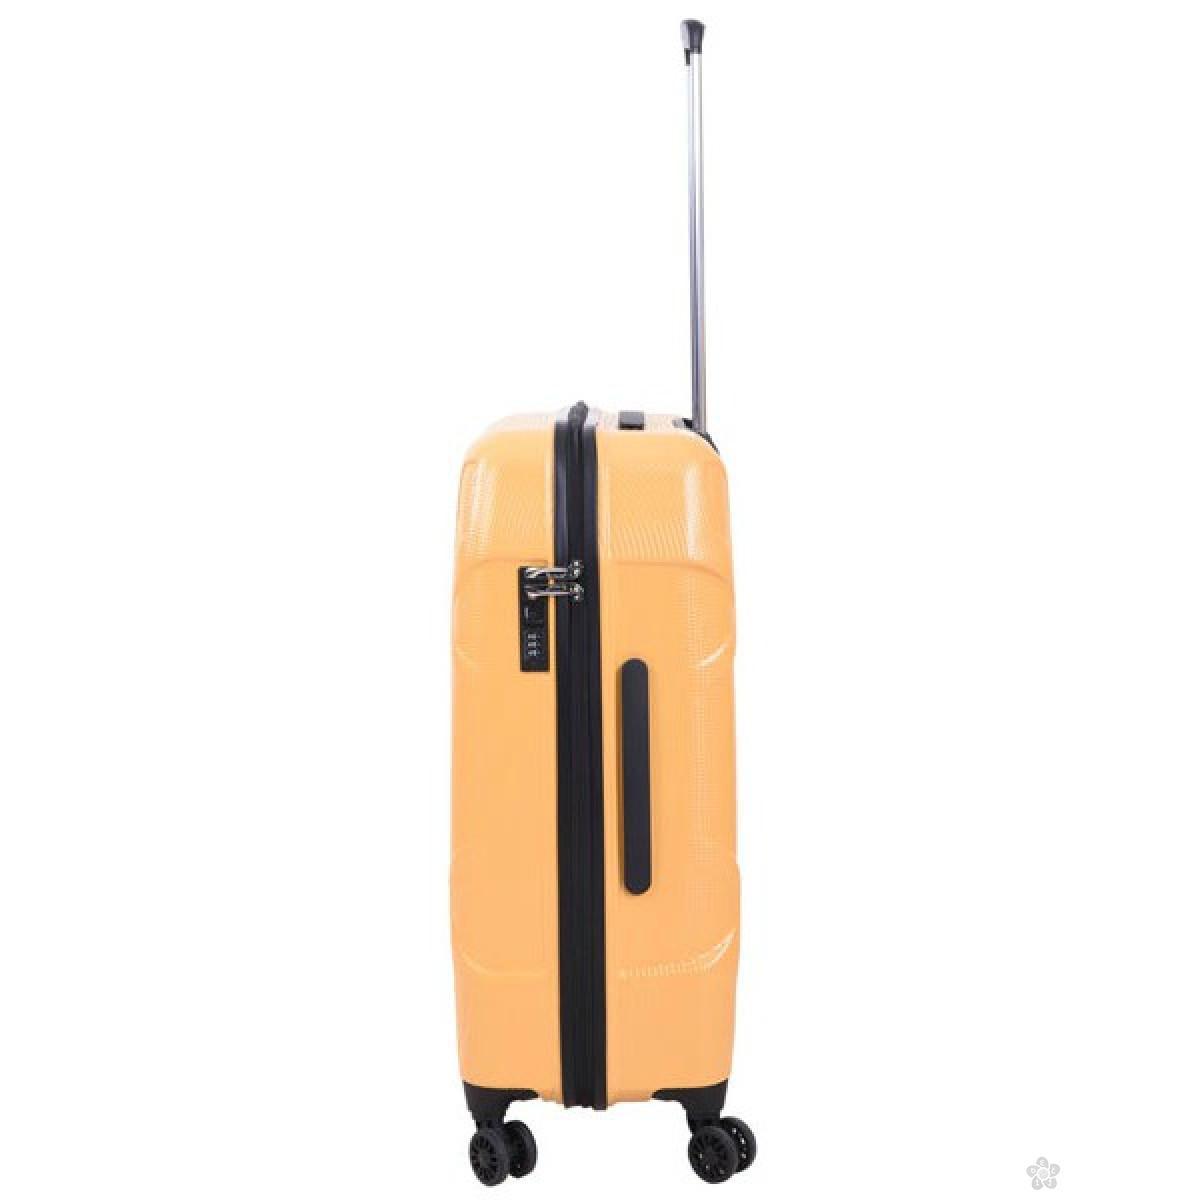 Kofer Pulse Soho žuti 24inch X21159